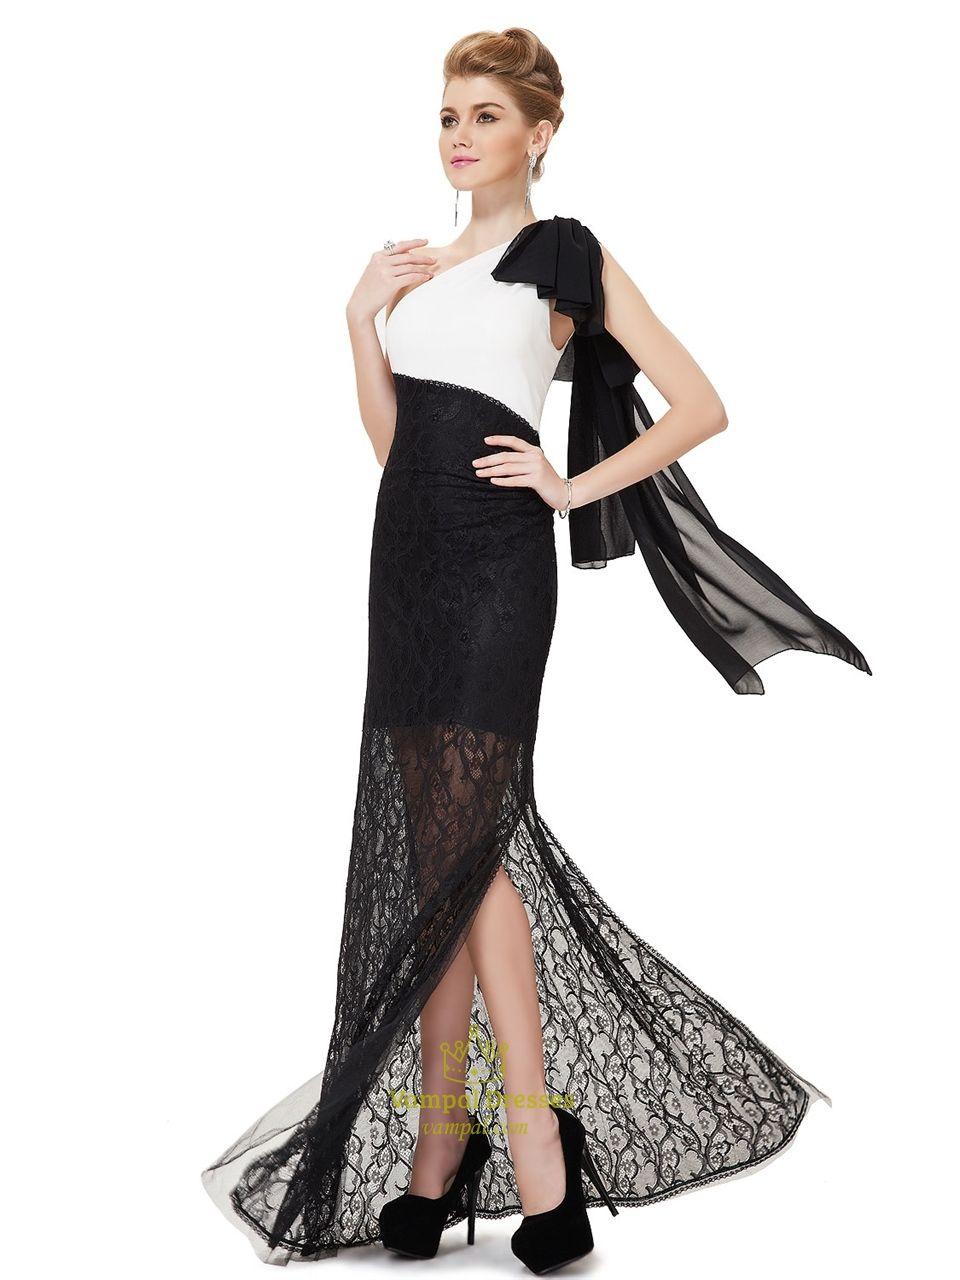 White top black bottom dress images